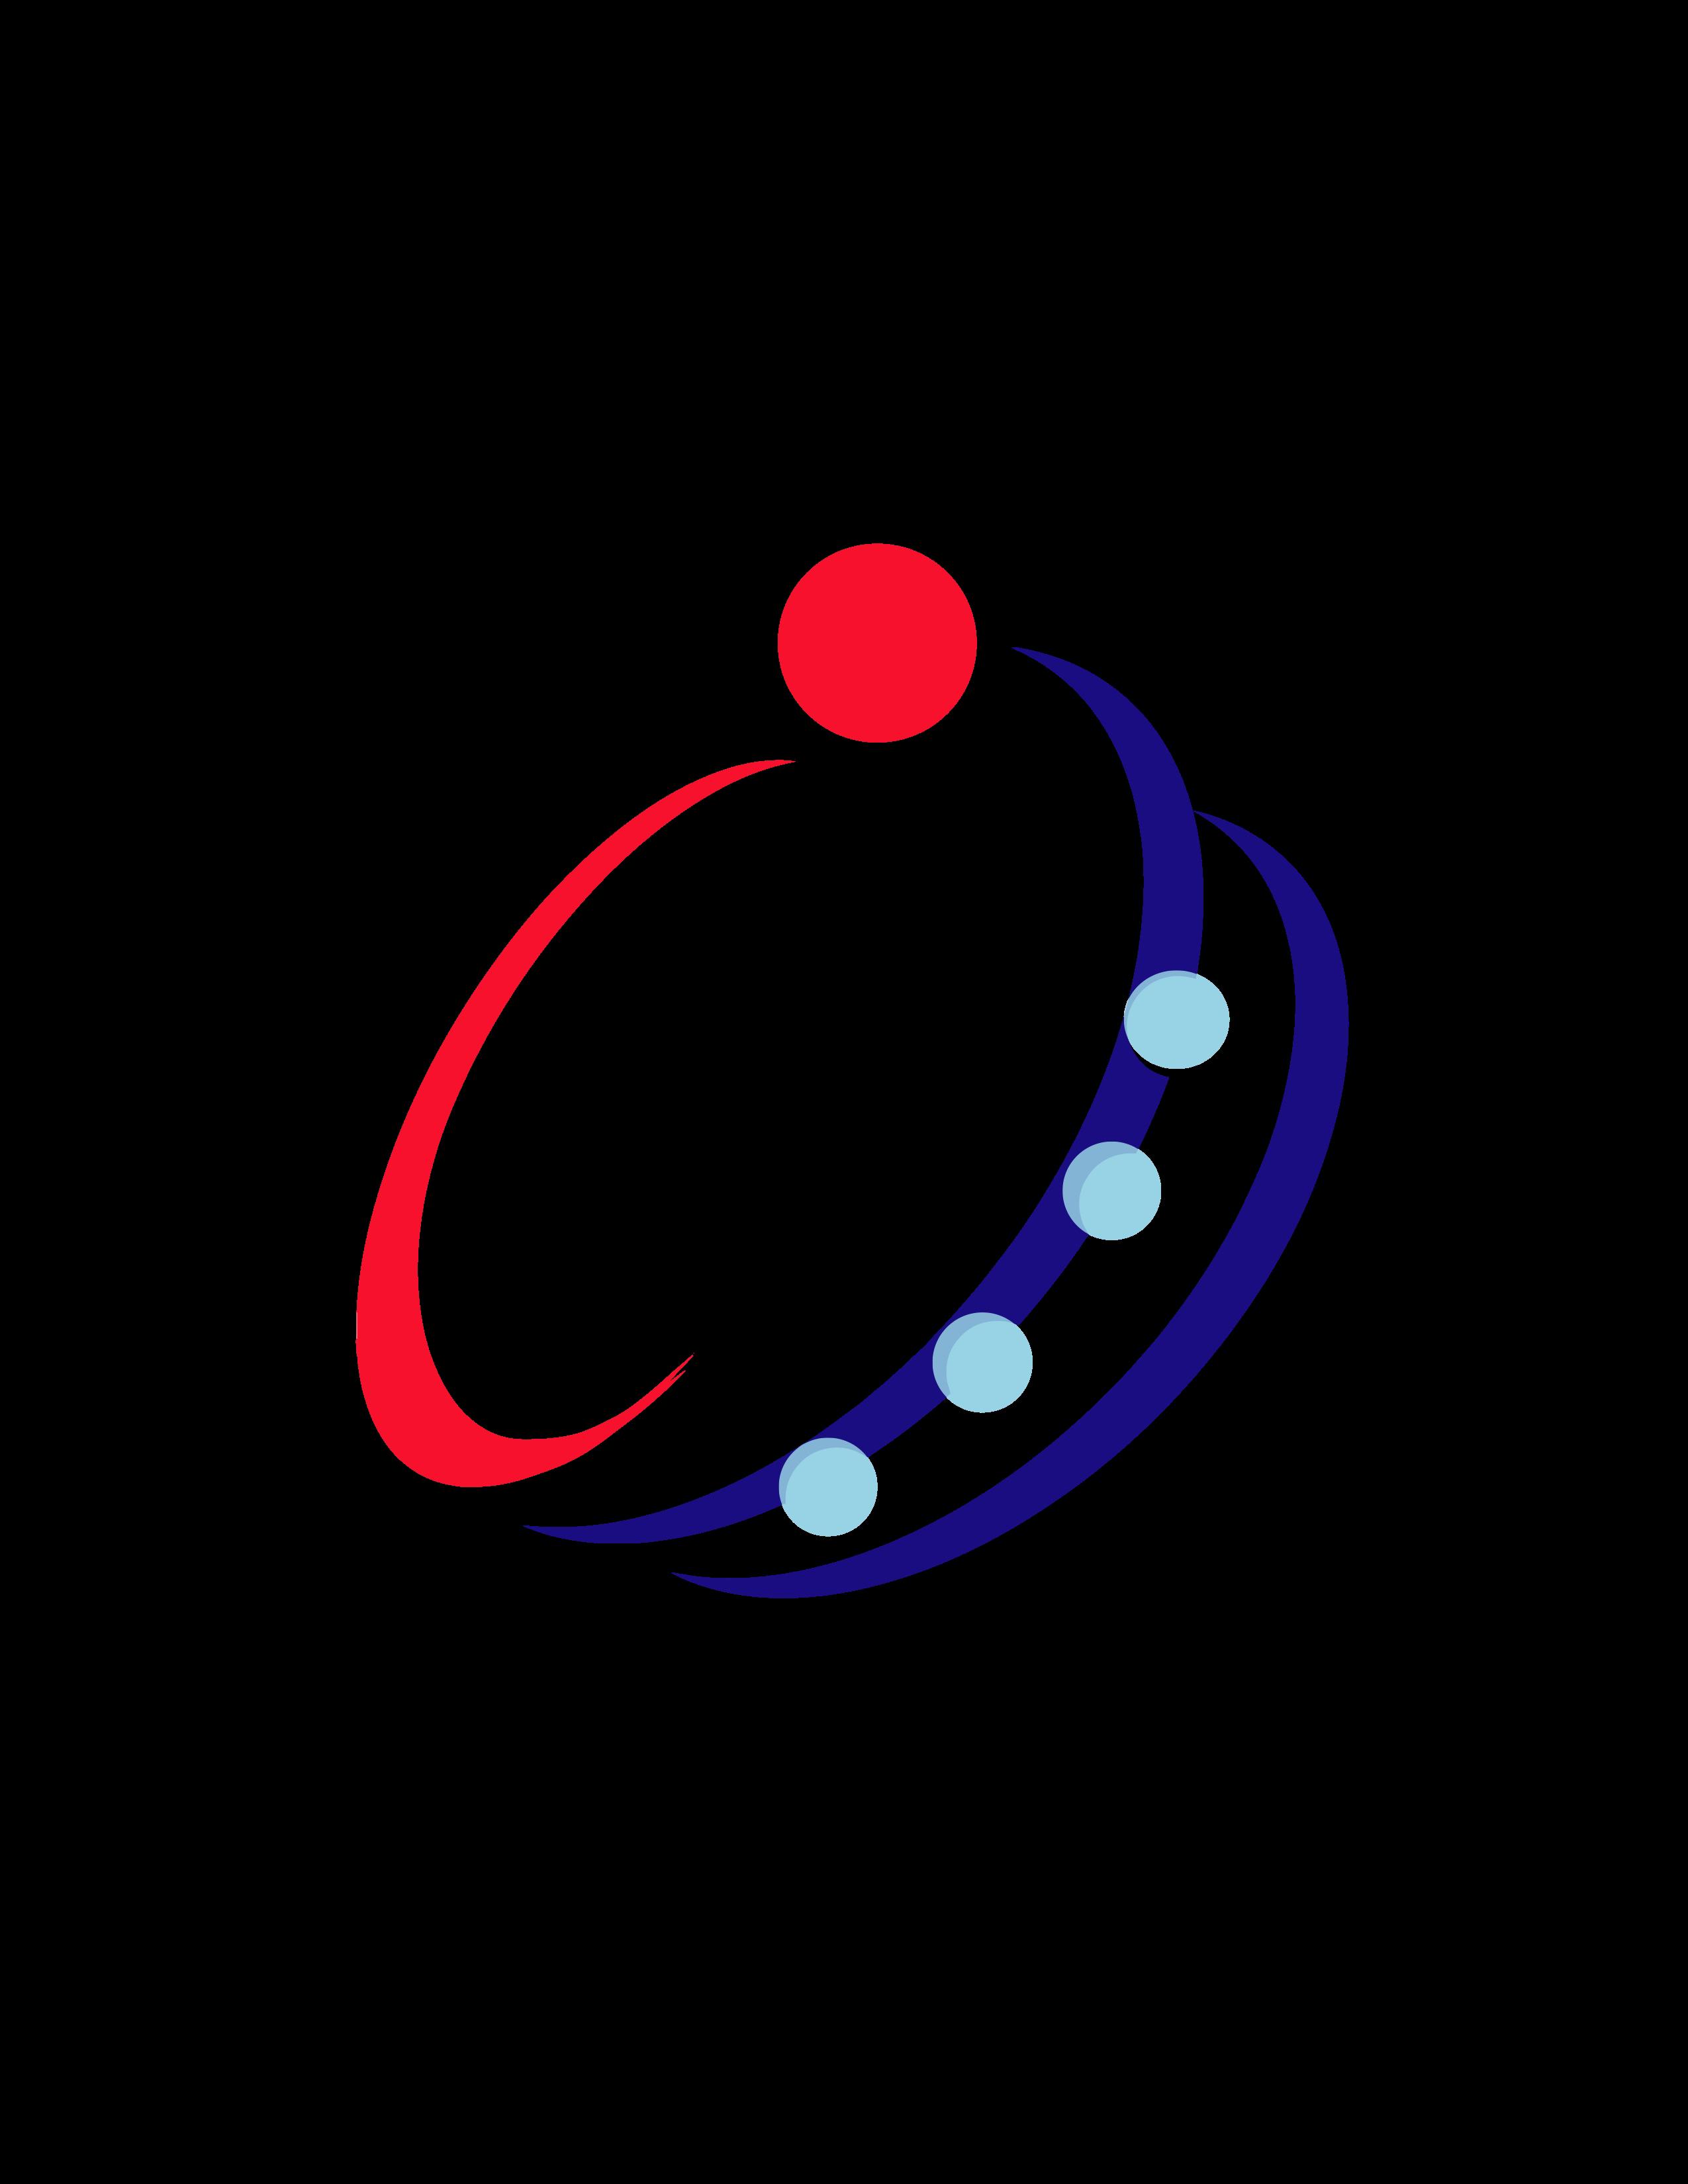 Dee & Dee Lanka (Pvt) Ltd